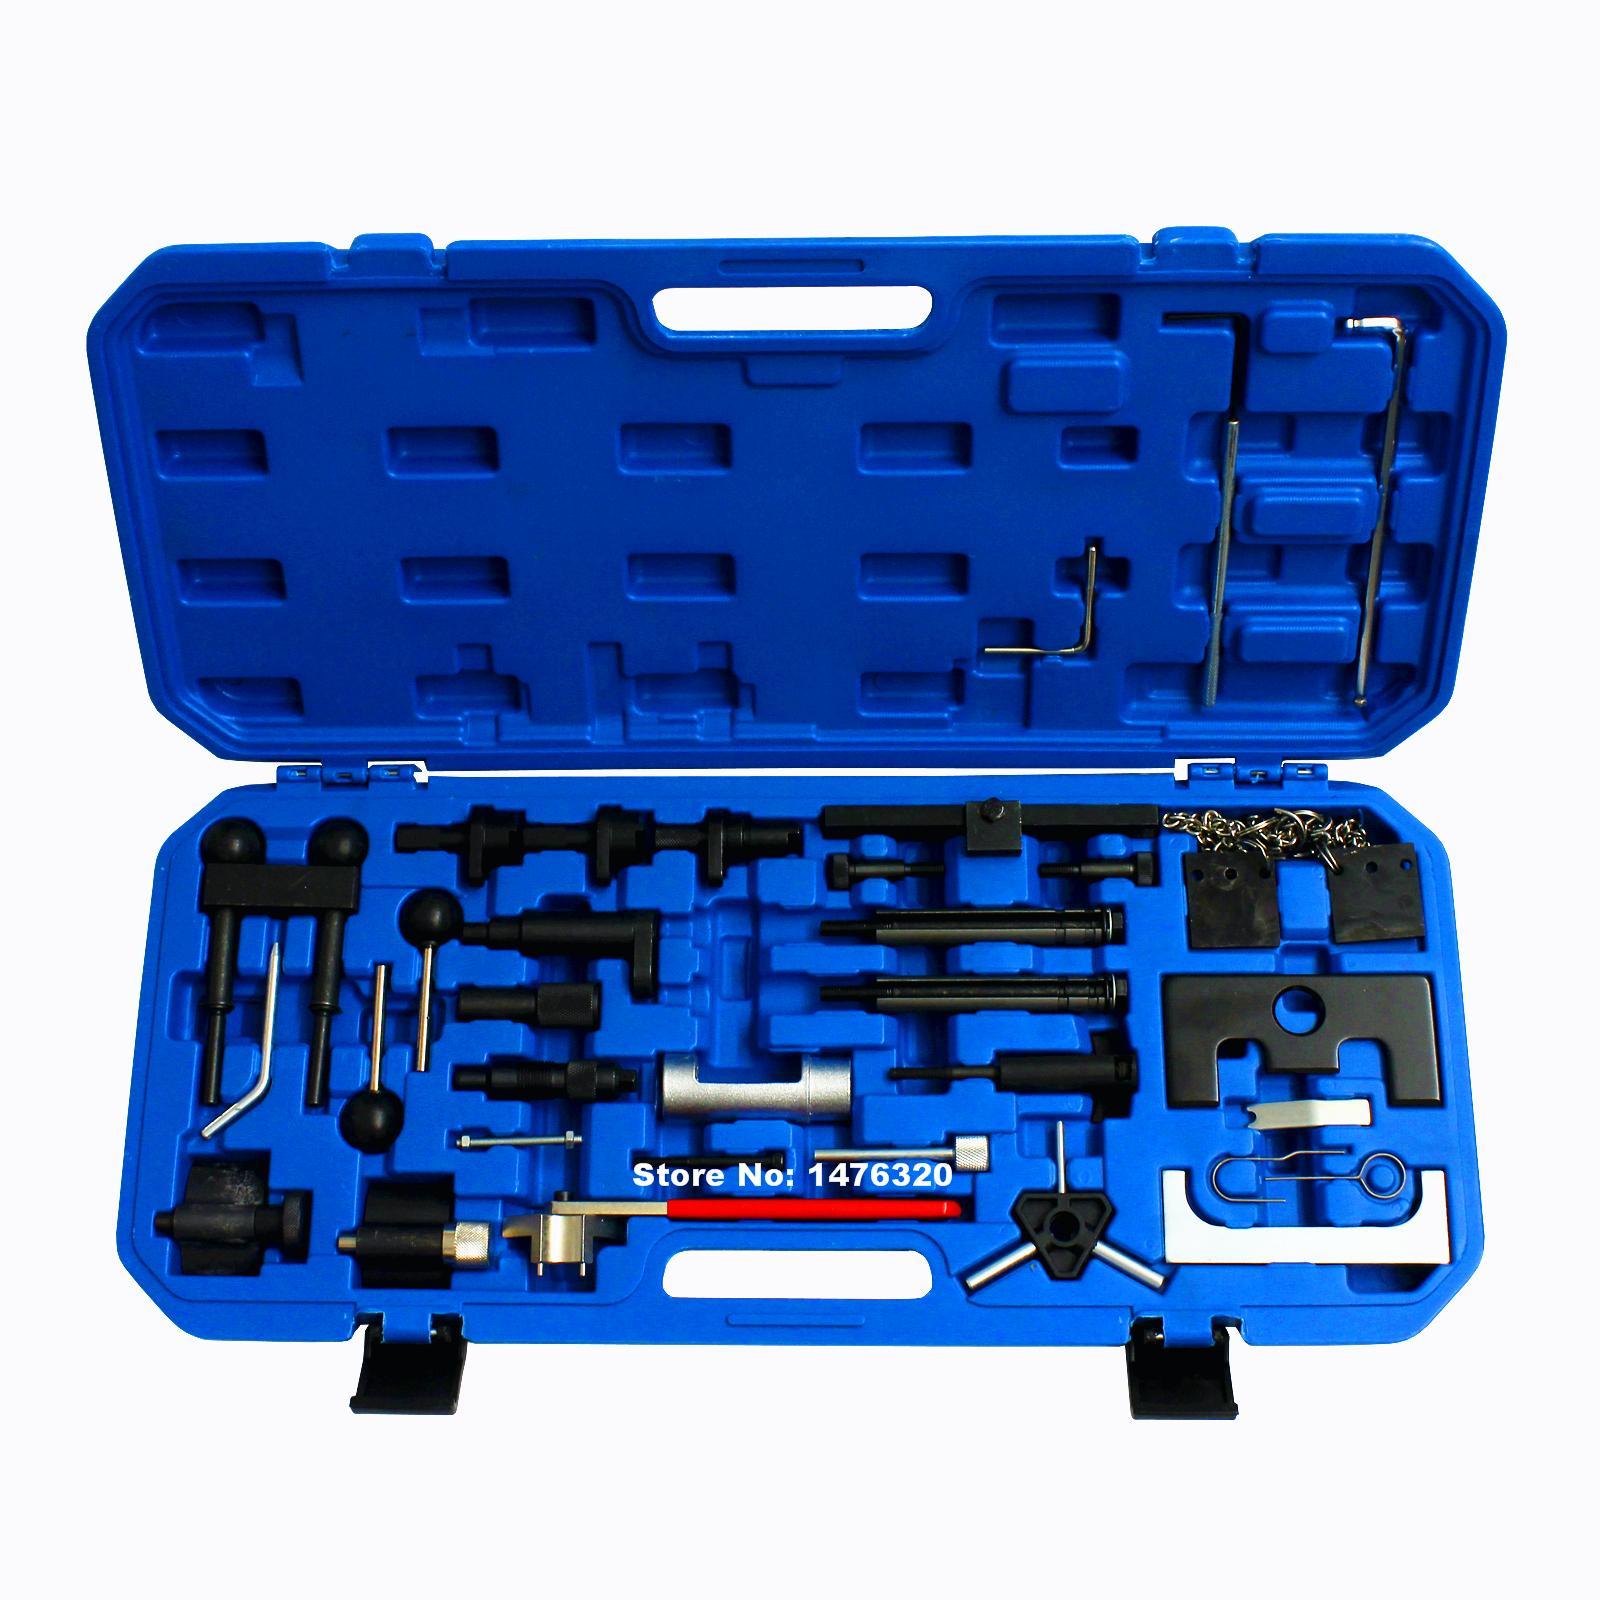 Automotive Diesel Petrol Engine Timing Tool Kit For VW AUDI A2/A3/S3/A4/A6/TT & 1.2/1.4/1.6/1.8/1.8T/2.0 AT2055 engine camshaft crankshaft locking alignment timing tool kit for audi a2 a3 a4 a6 a8 2 4 3 2l v6 fsi st0169